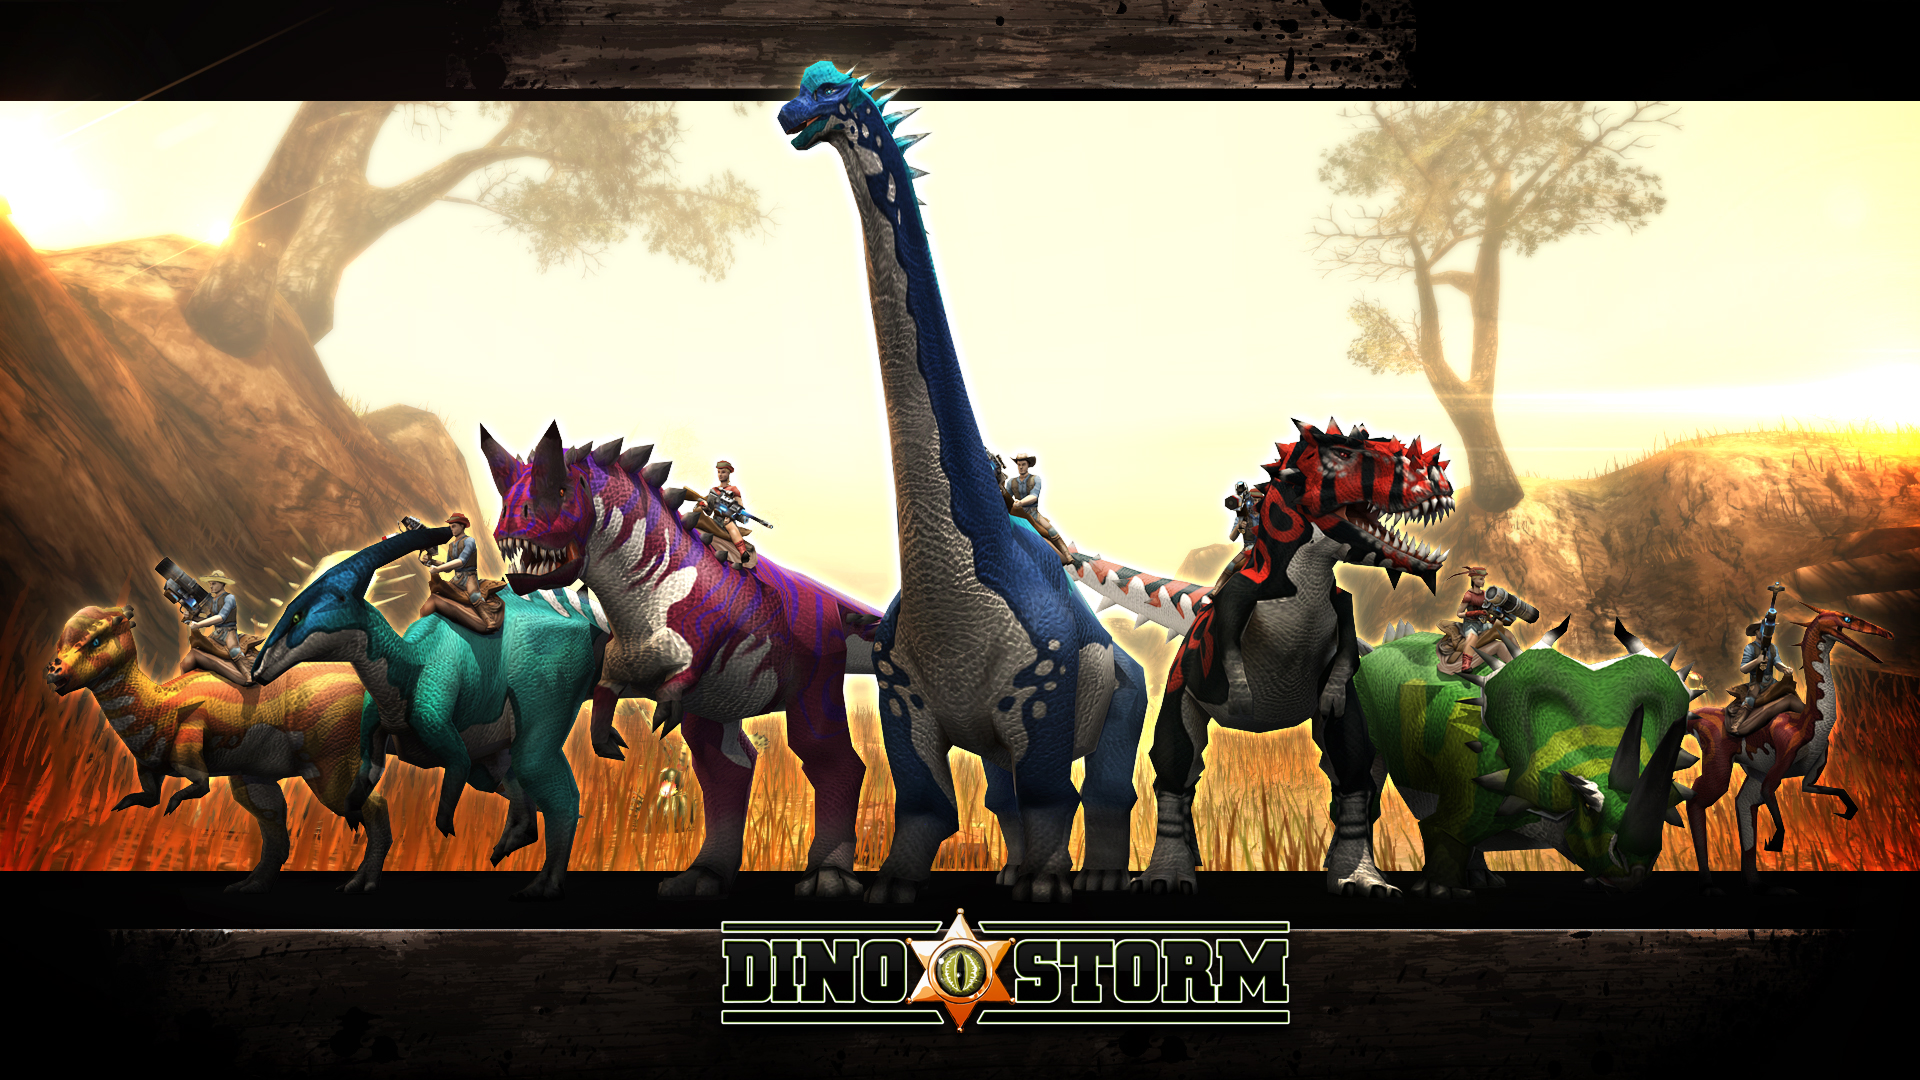 dino storm media wallpaper artwork screenshots more